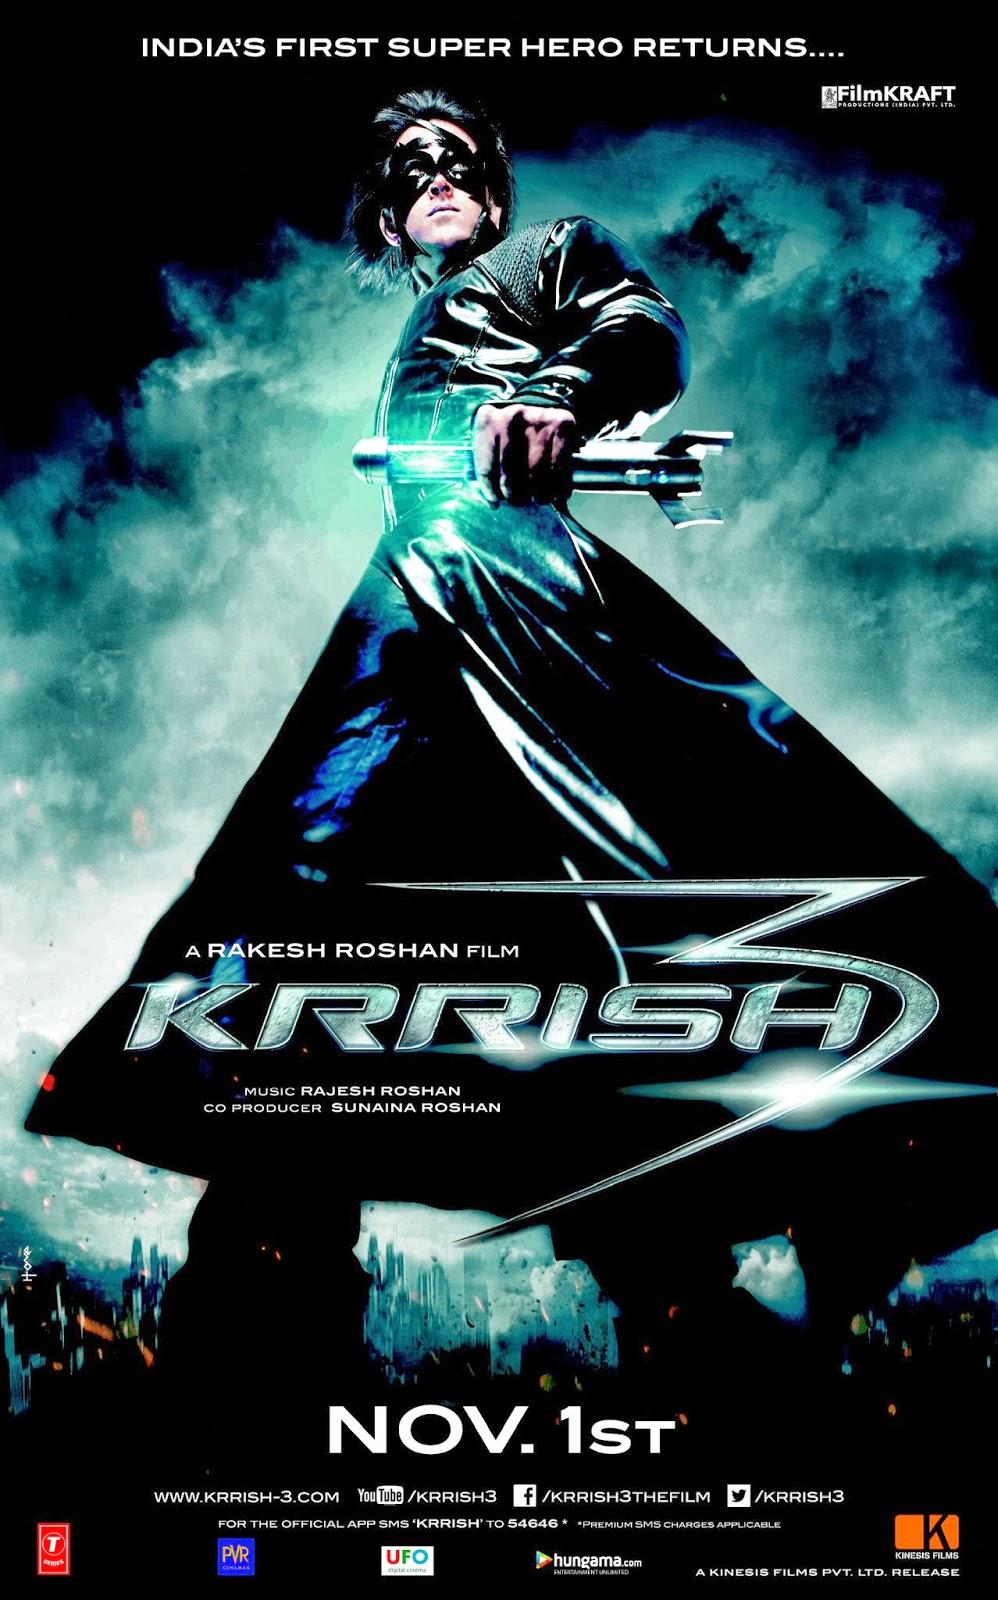 Krrish 3 (V.O.S) (2013)